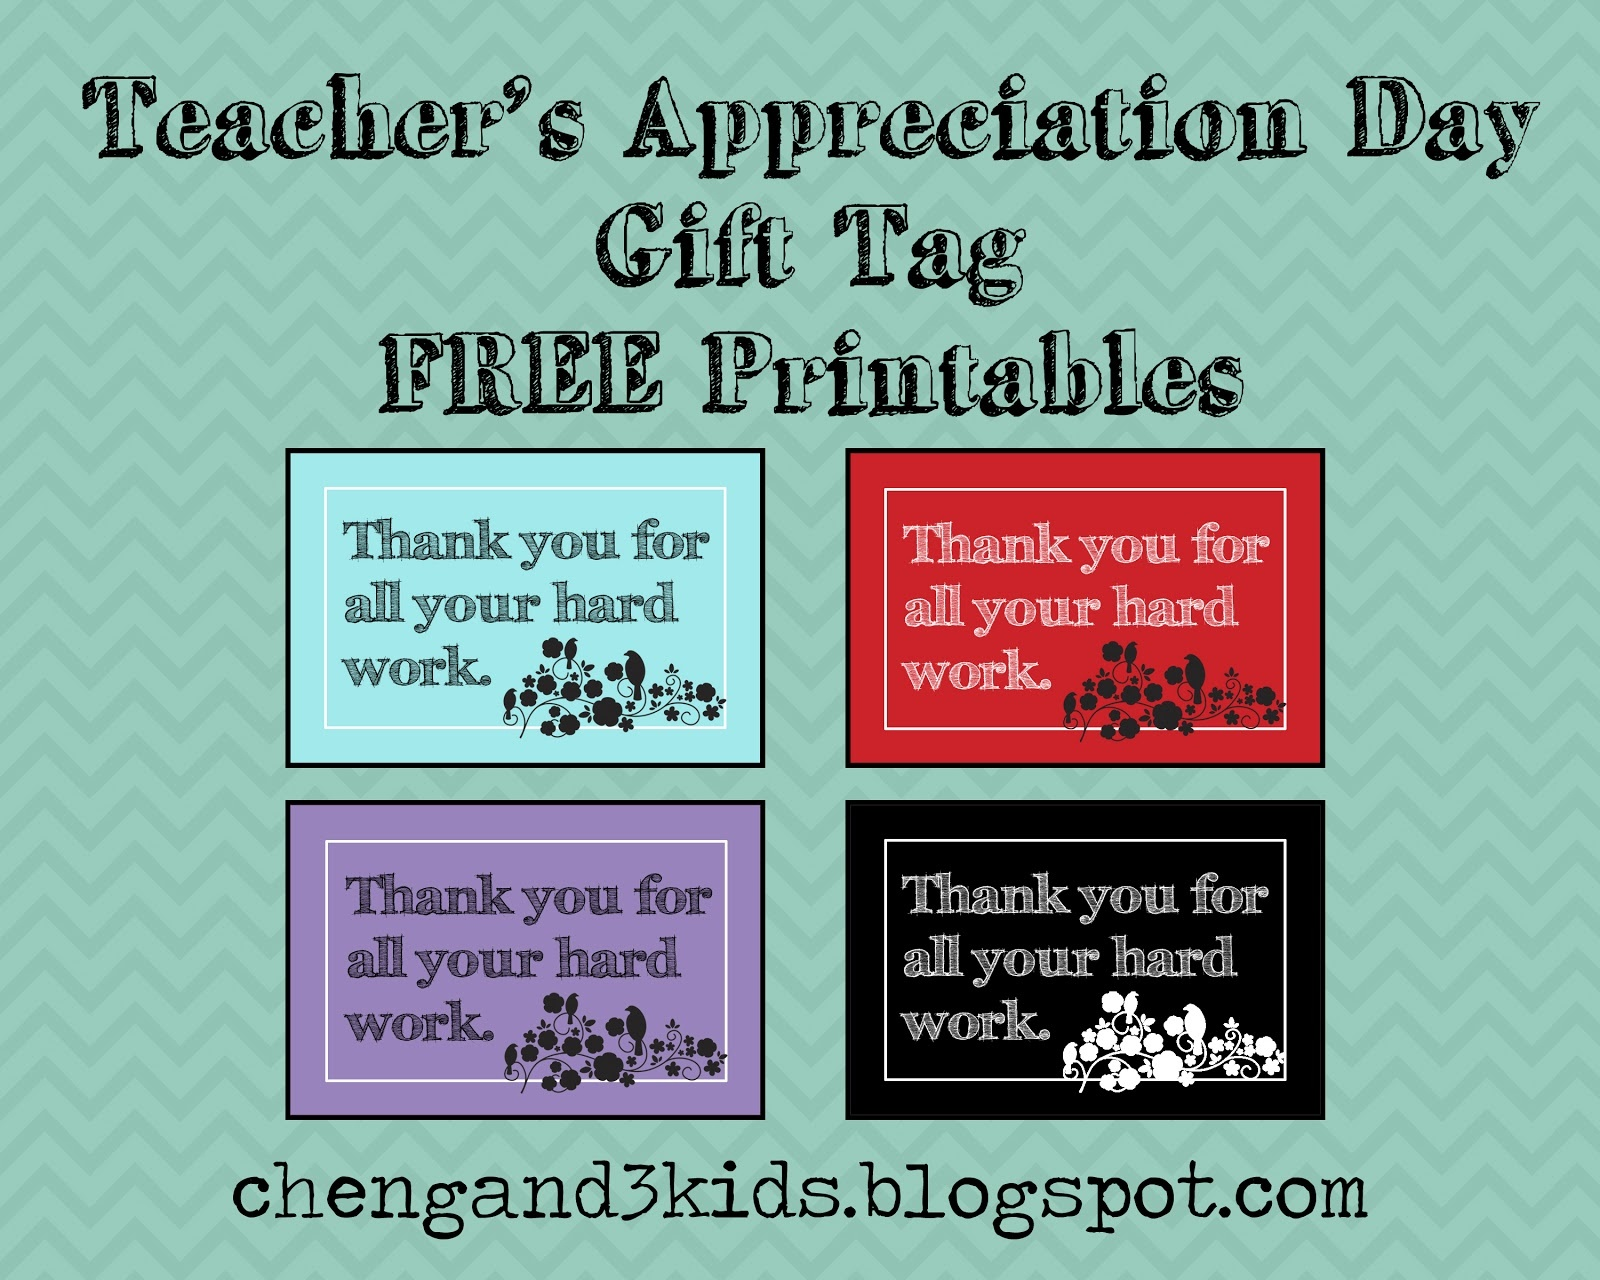 Free Printable Tags For Teacher Appreciation - All Free Tag Designs - Free Printable Name Tags For Teachers